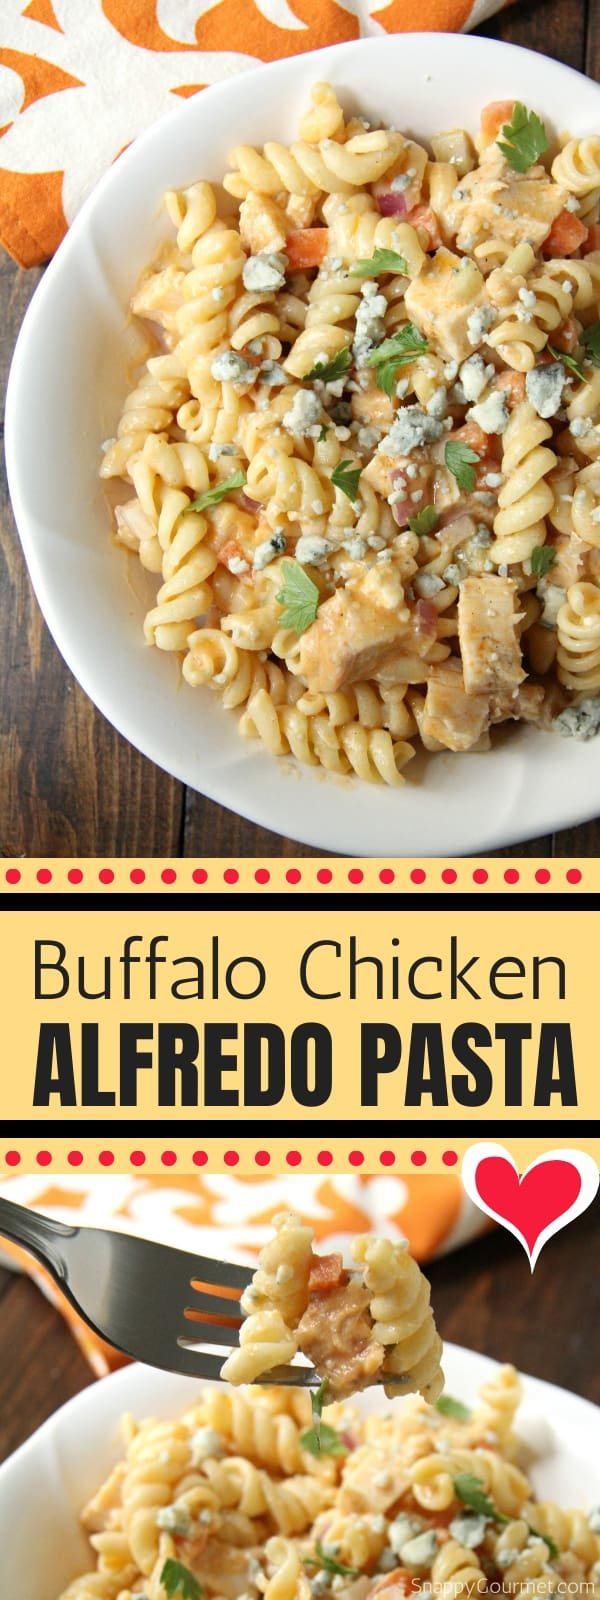 Buffalo Chicken Alfredo Pasta collage